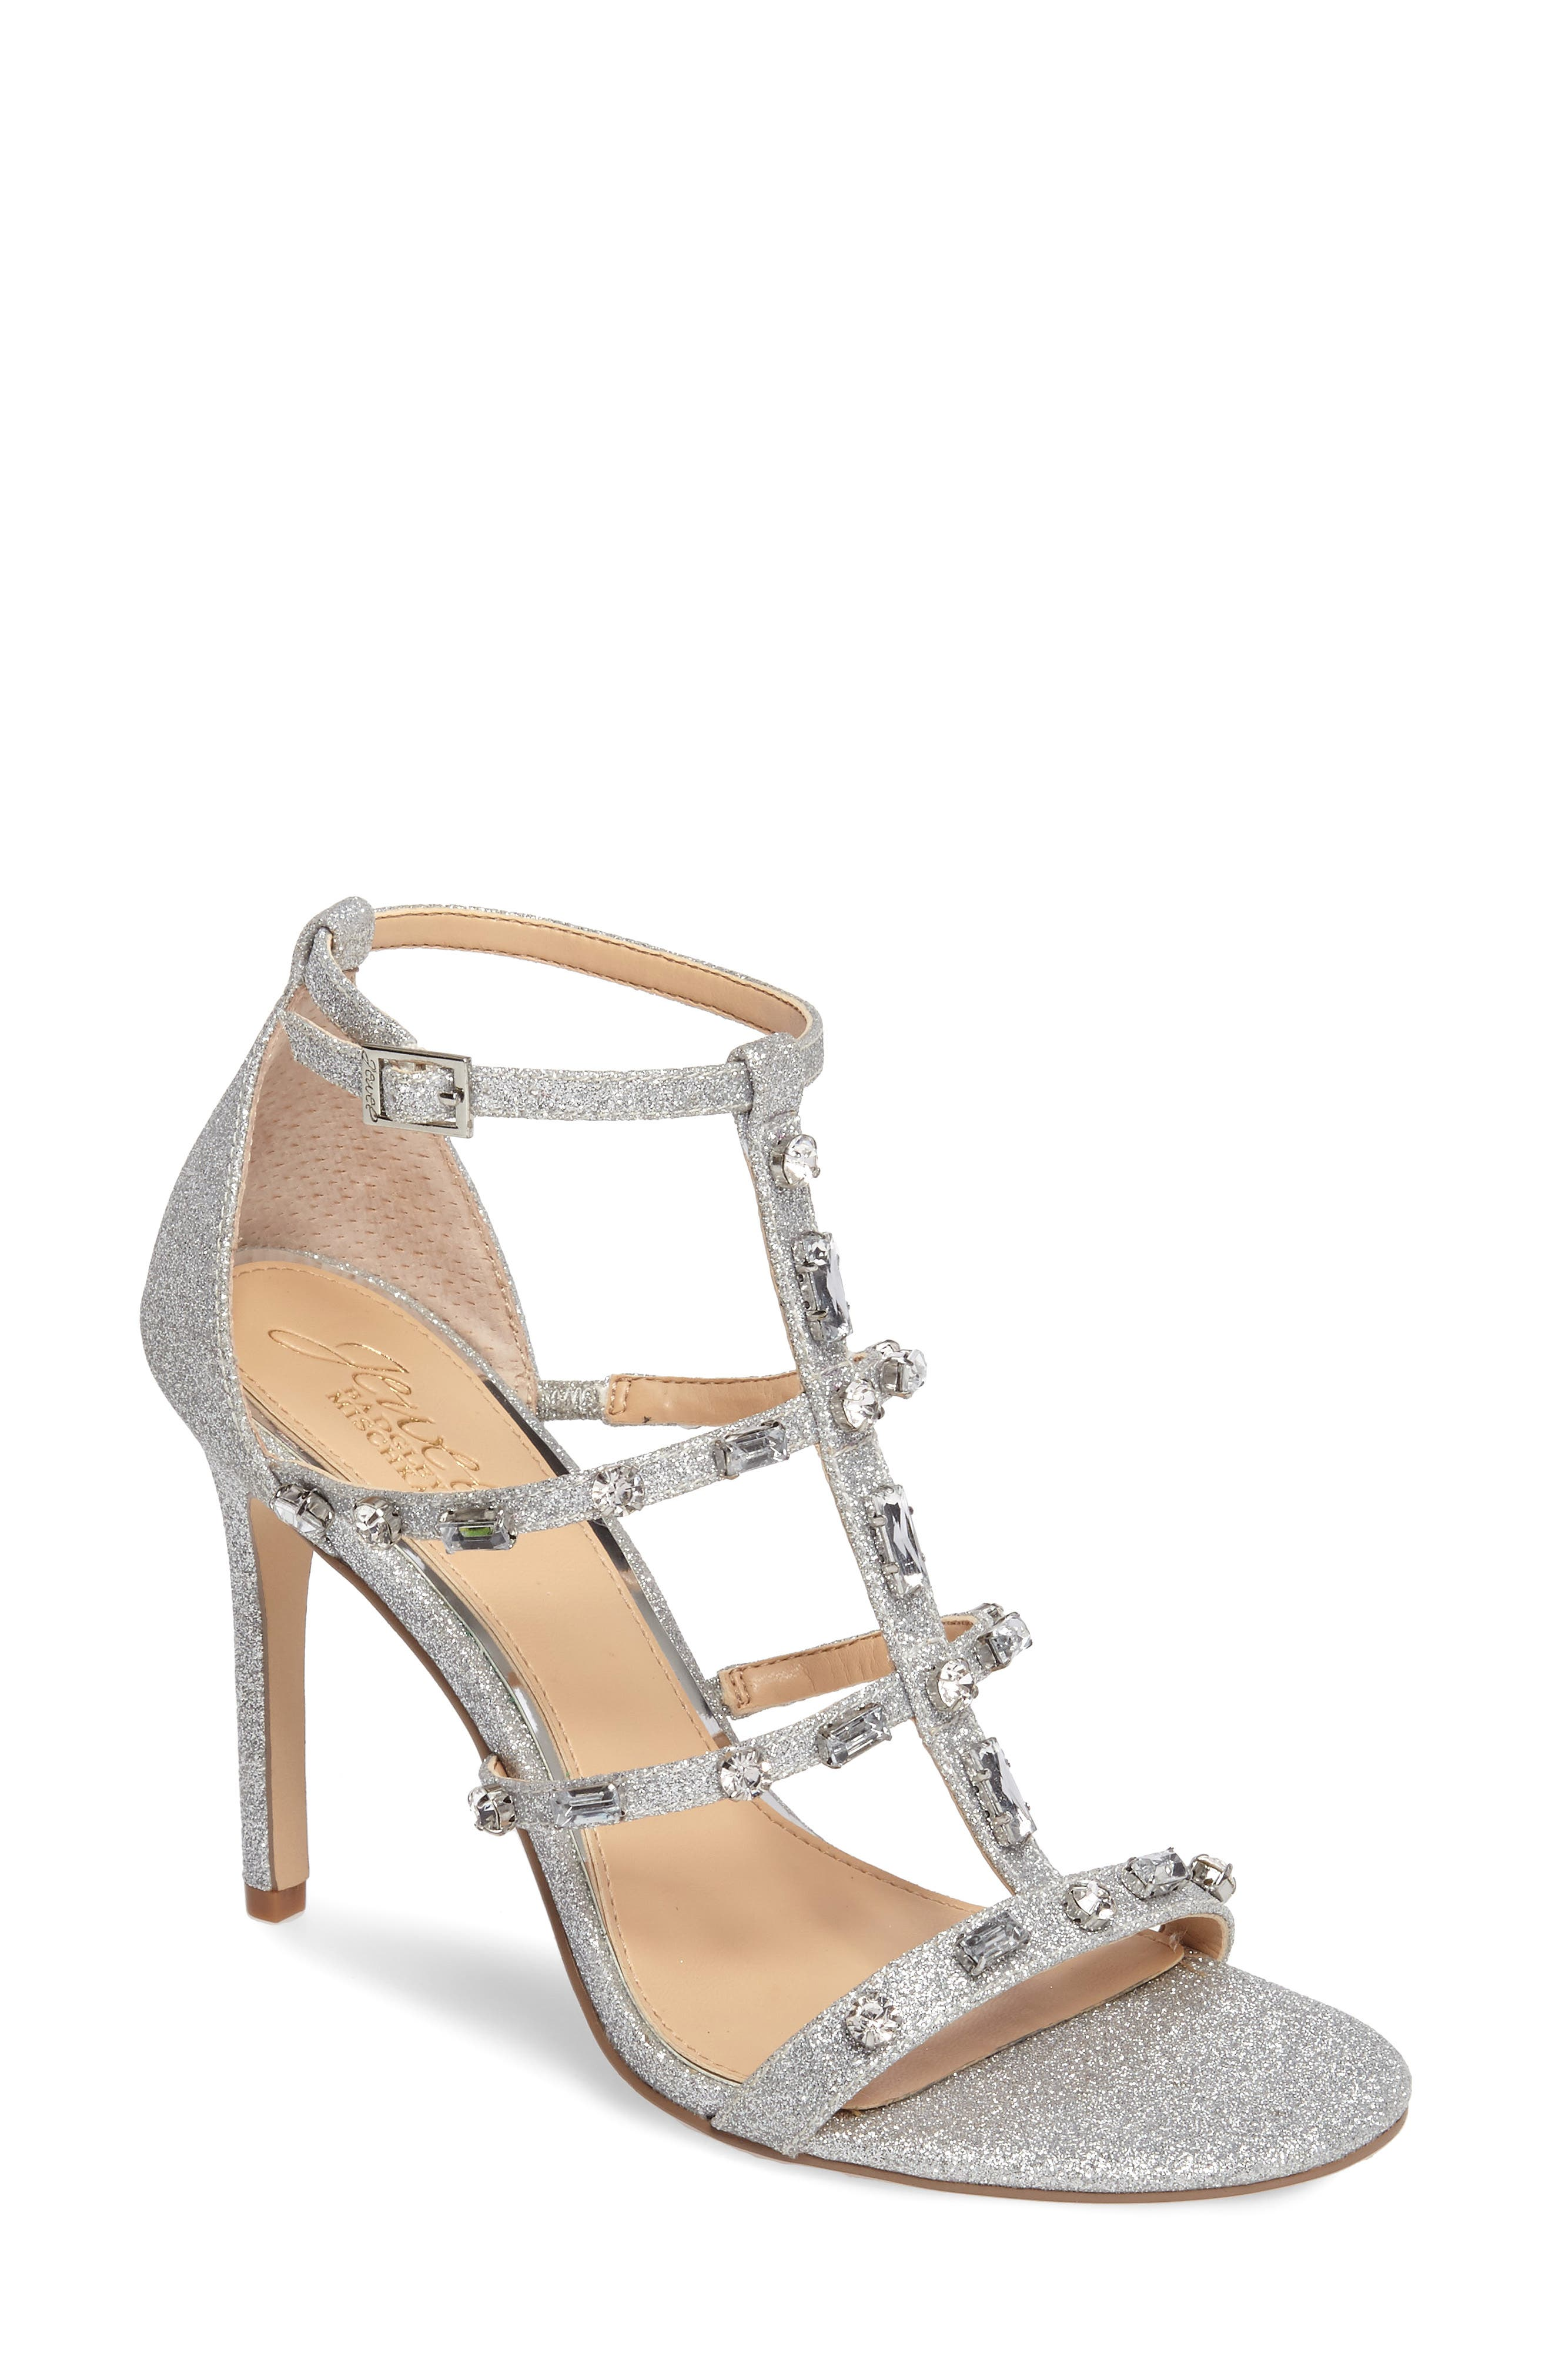 Jewel Badgley Mischka Adela Glittery Embellished Cage Sandal (Women)